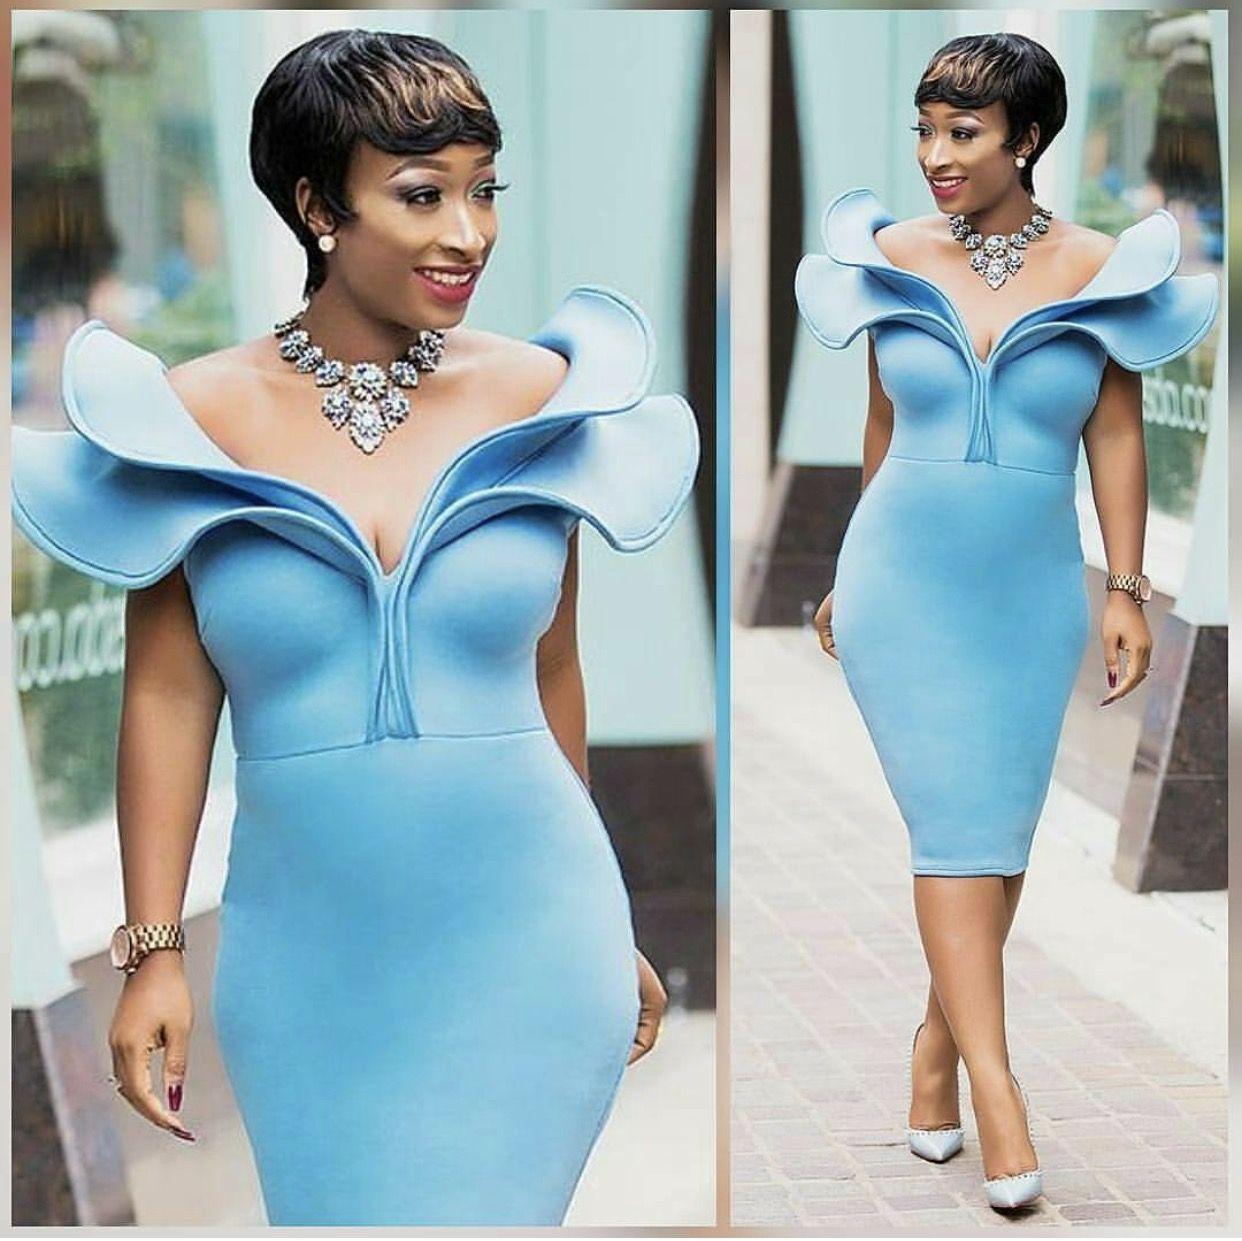 Pin by Oretha Ward on african wear | Pinterest | African fashion ...